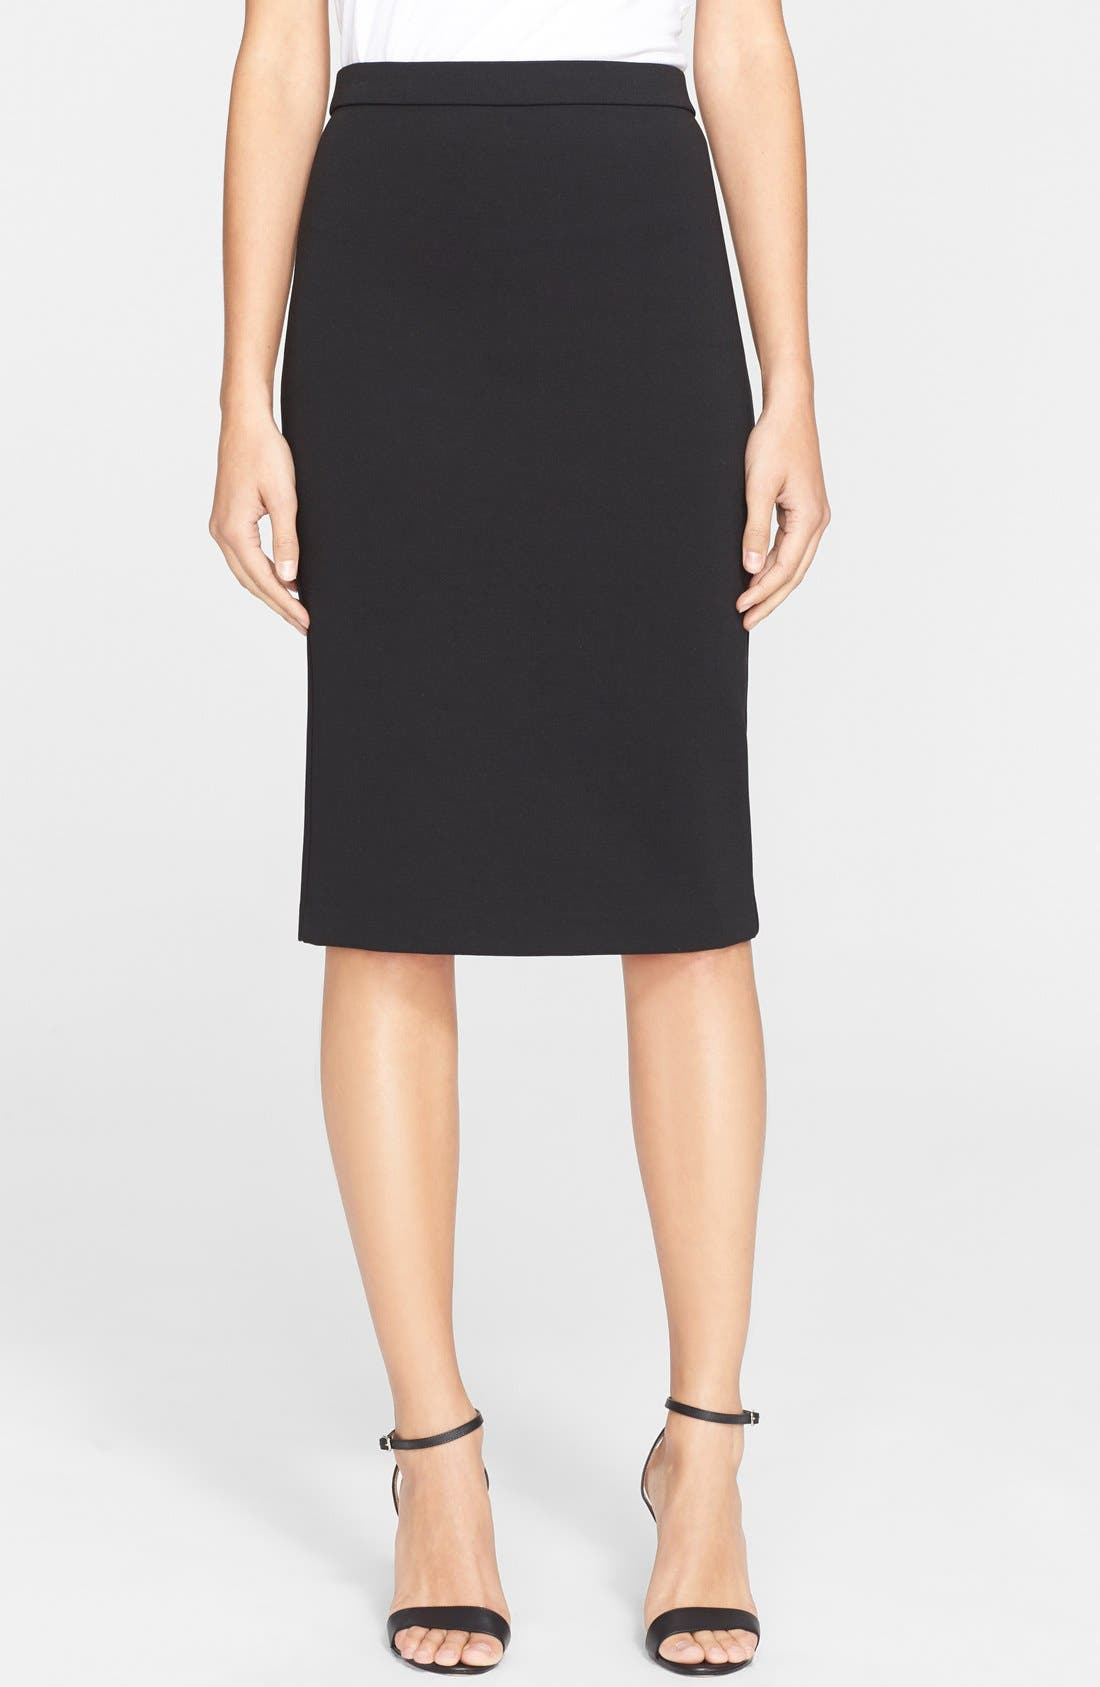 Alternate Image 1 Selected - Theory 'Lijnek' Ponte Knit Pencil Skirt